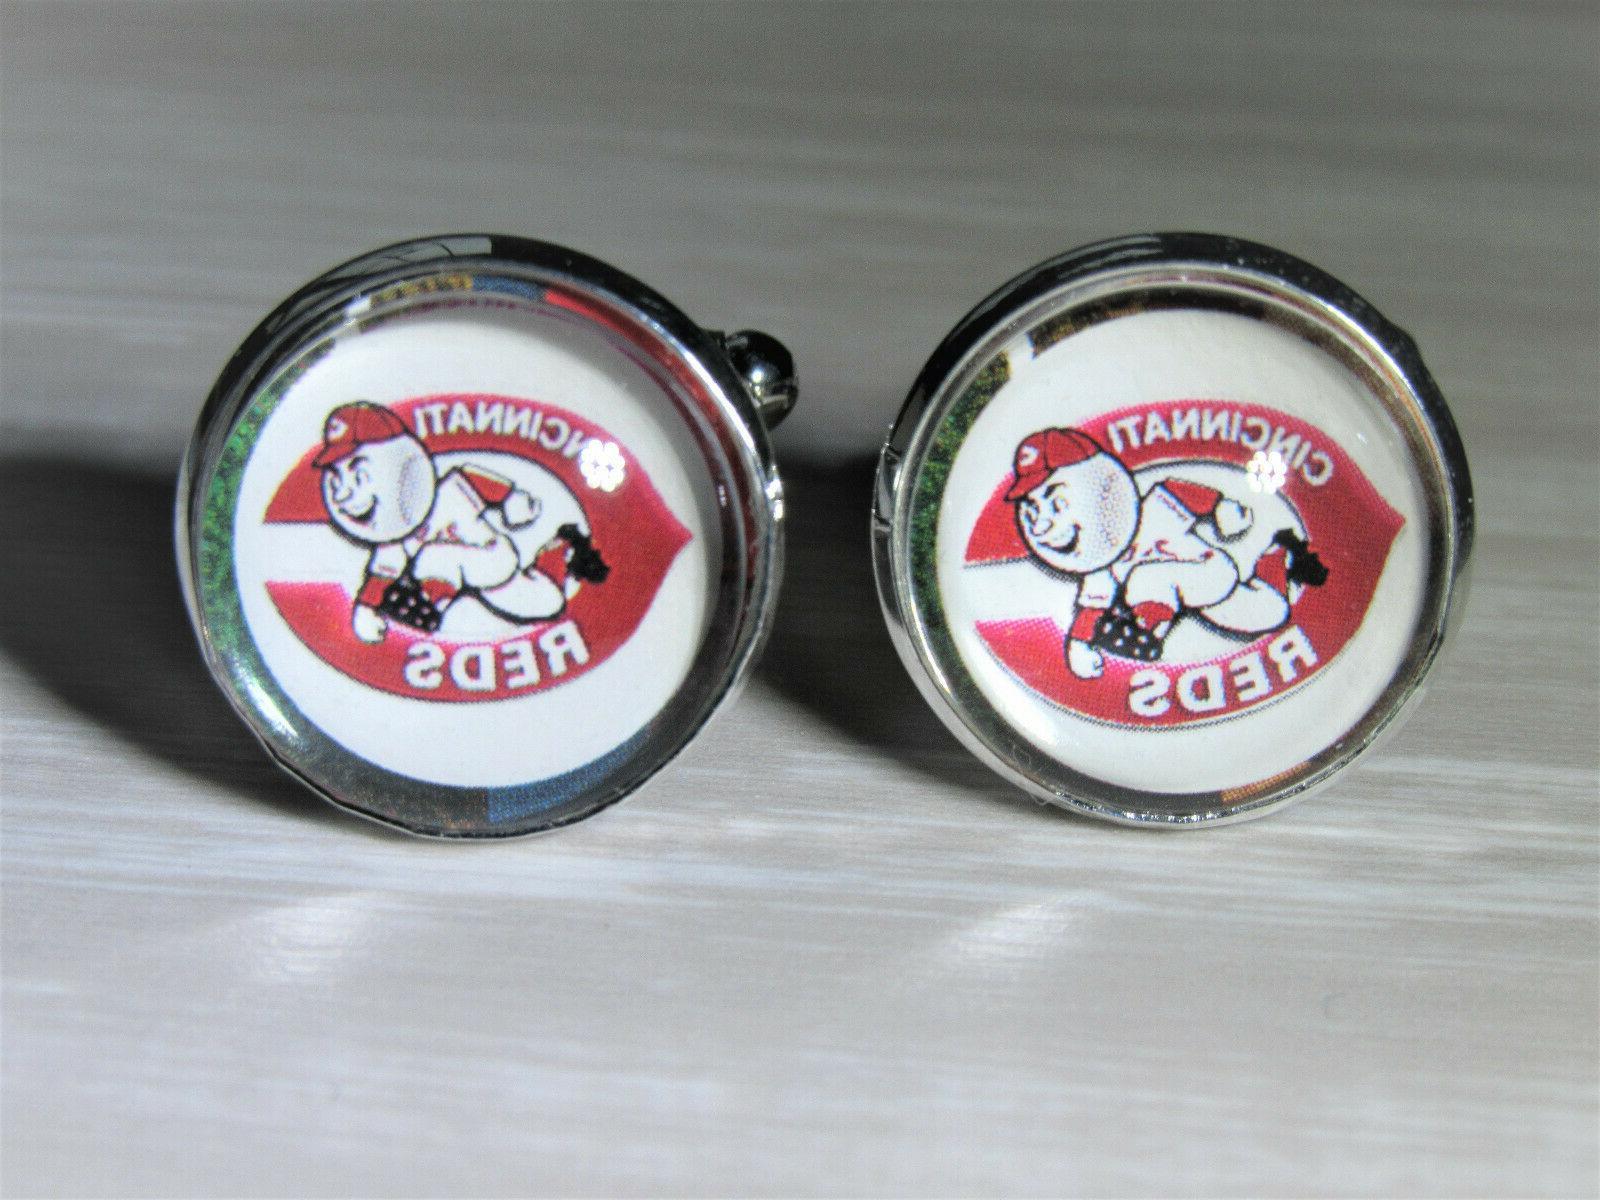 cincinnati reds cuff links made from baseball